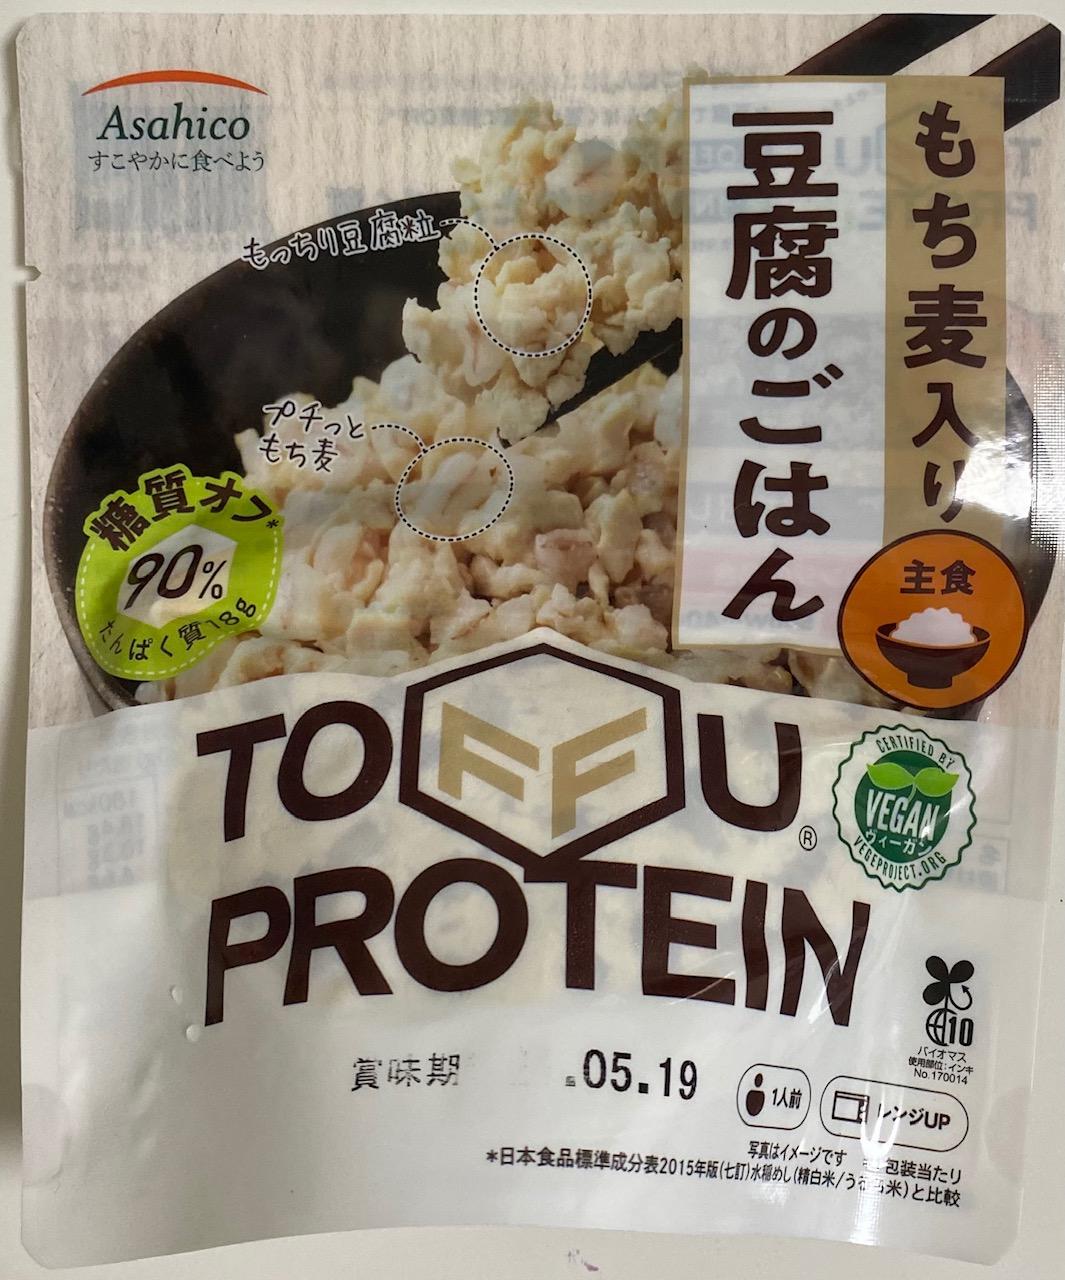 Asahico Toffu Protein Tofu Rice with Pearl Barley